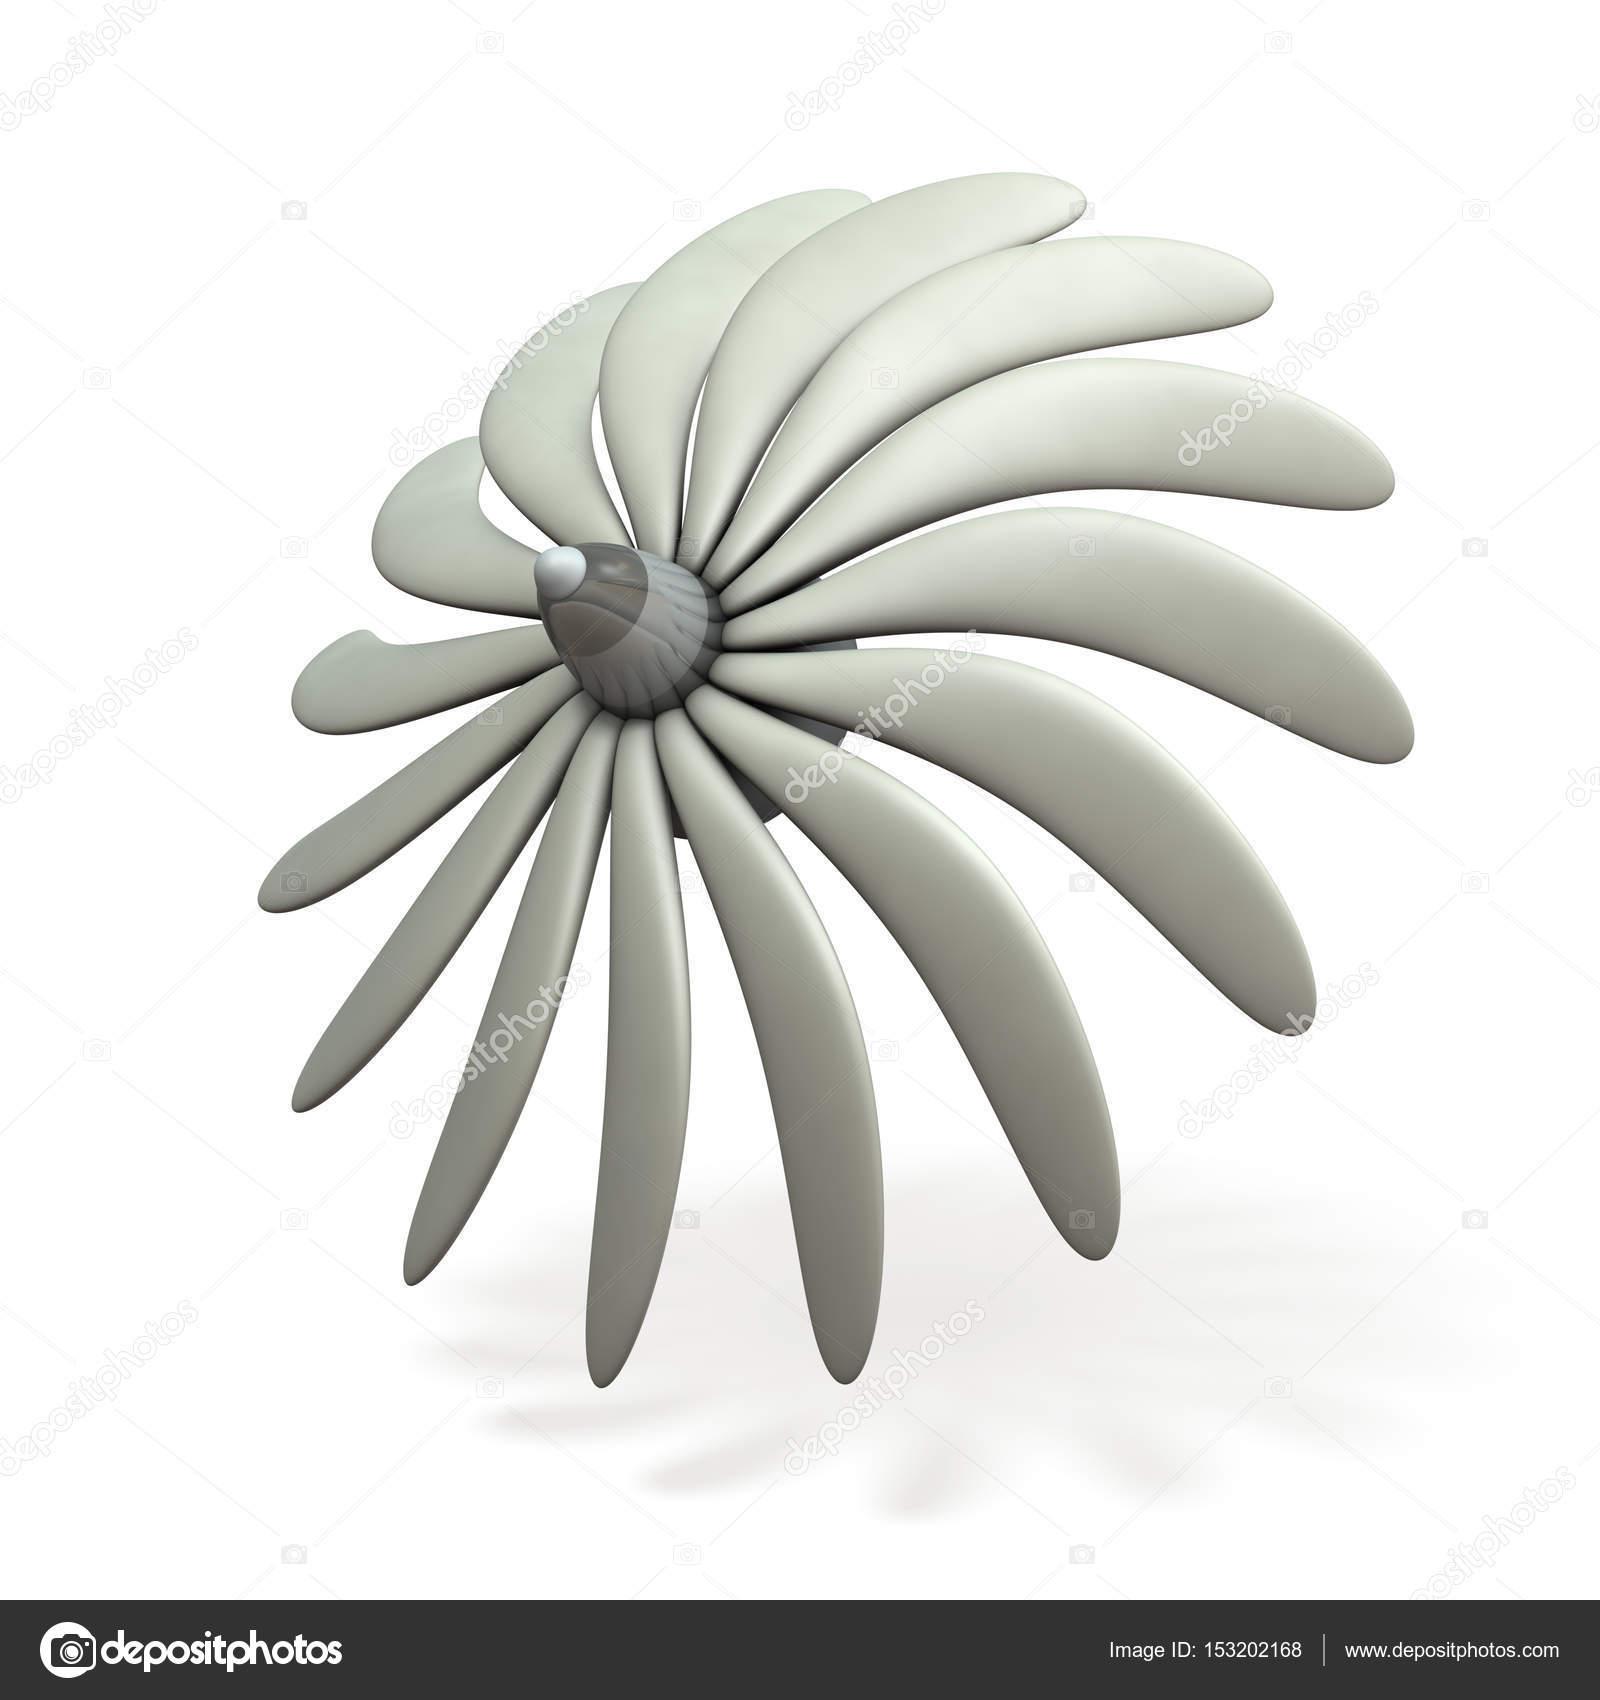 Eine imaginäre Turbine-Bild — Stockfoto © CYCLONEPROJECT #153202168